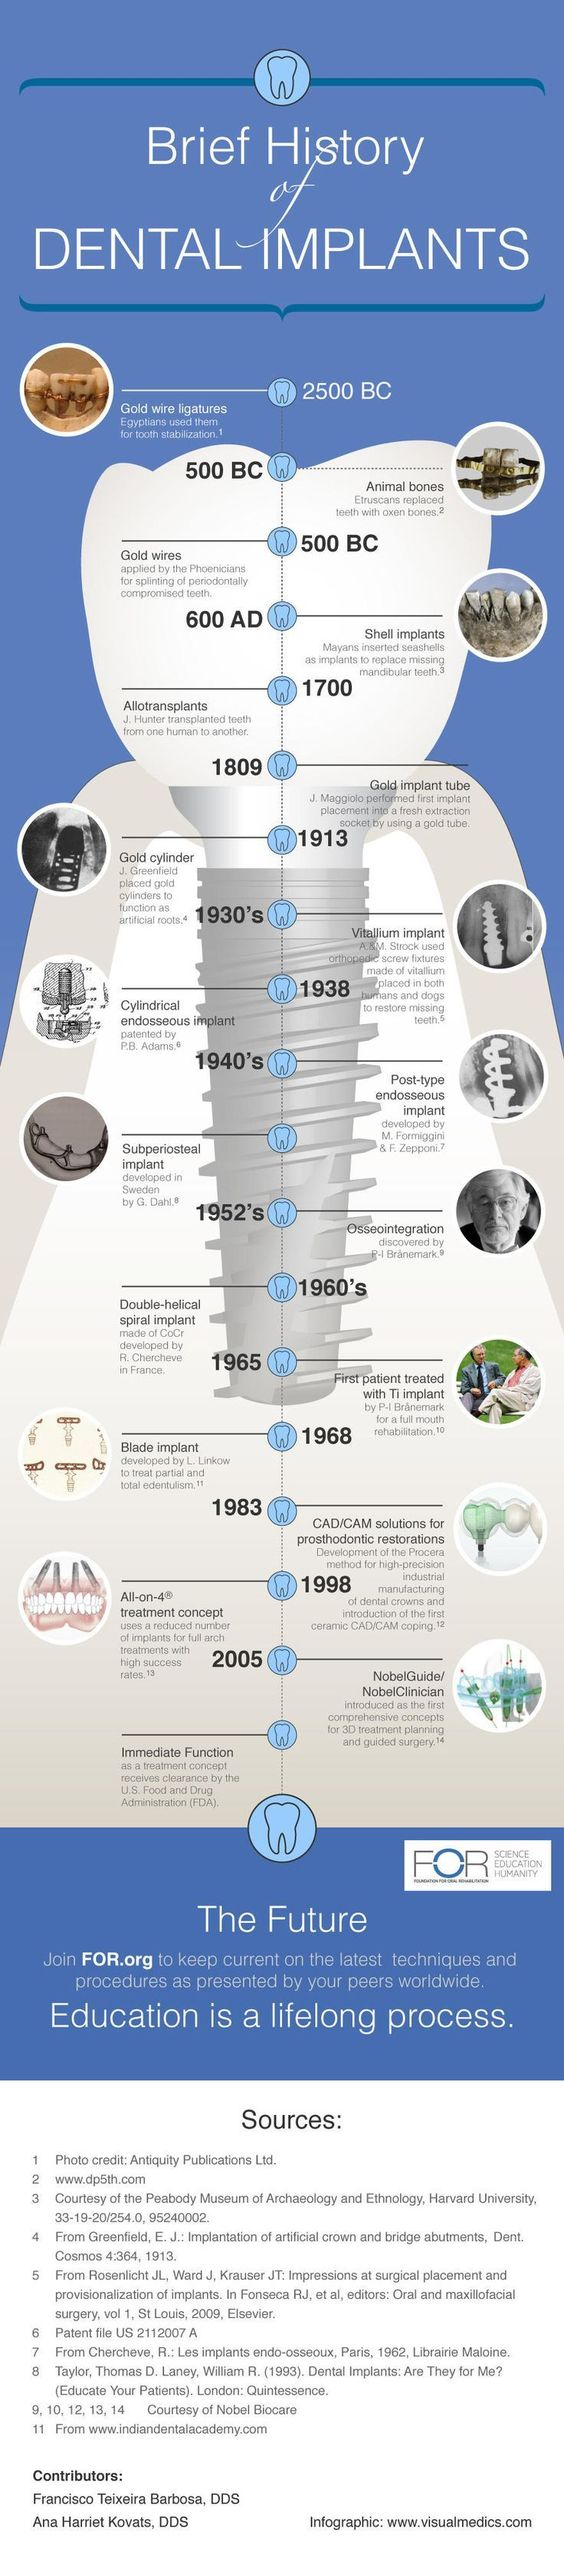 brief history of dental implants